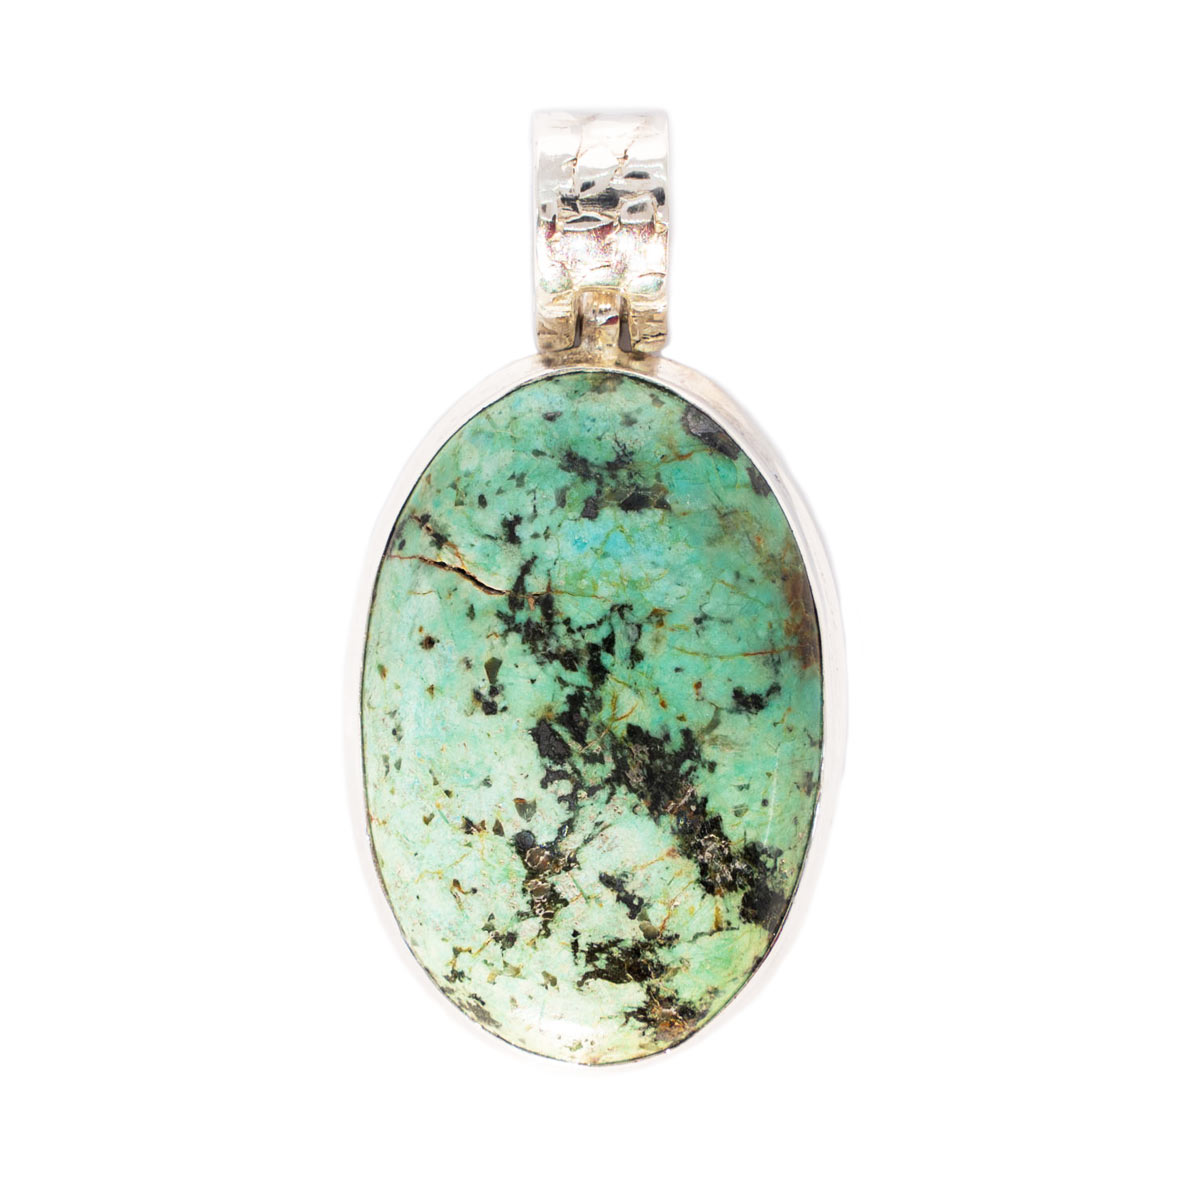 Sri Avinash Infused™ Norwegian Turquoise Pendant in Sterling Silver - Lightness & Joy Infusion